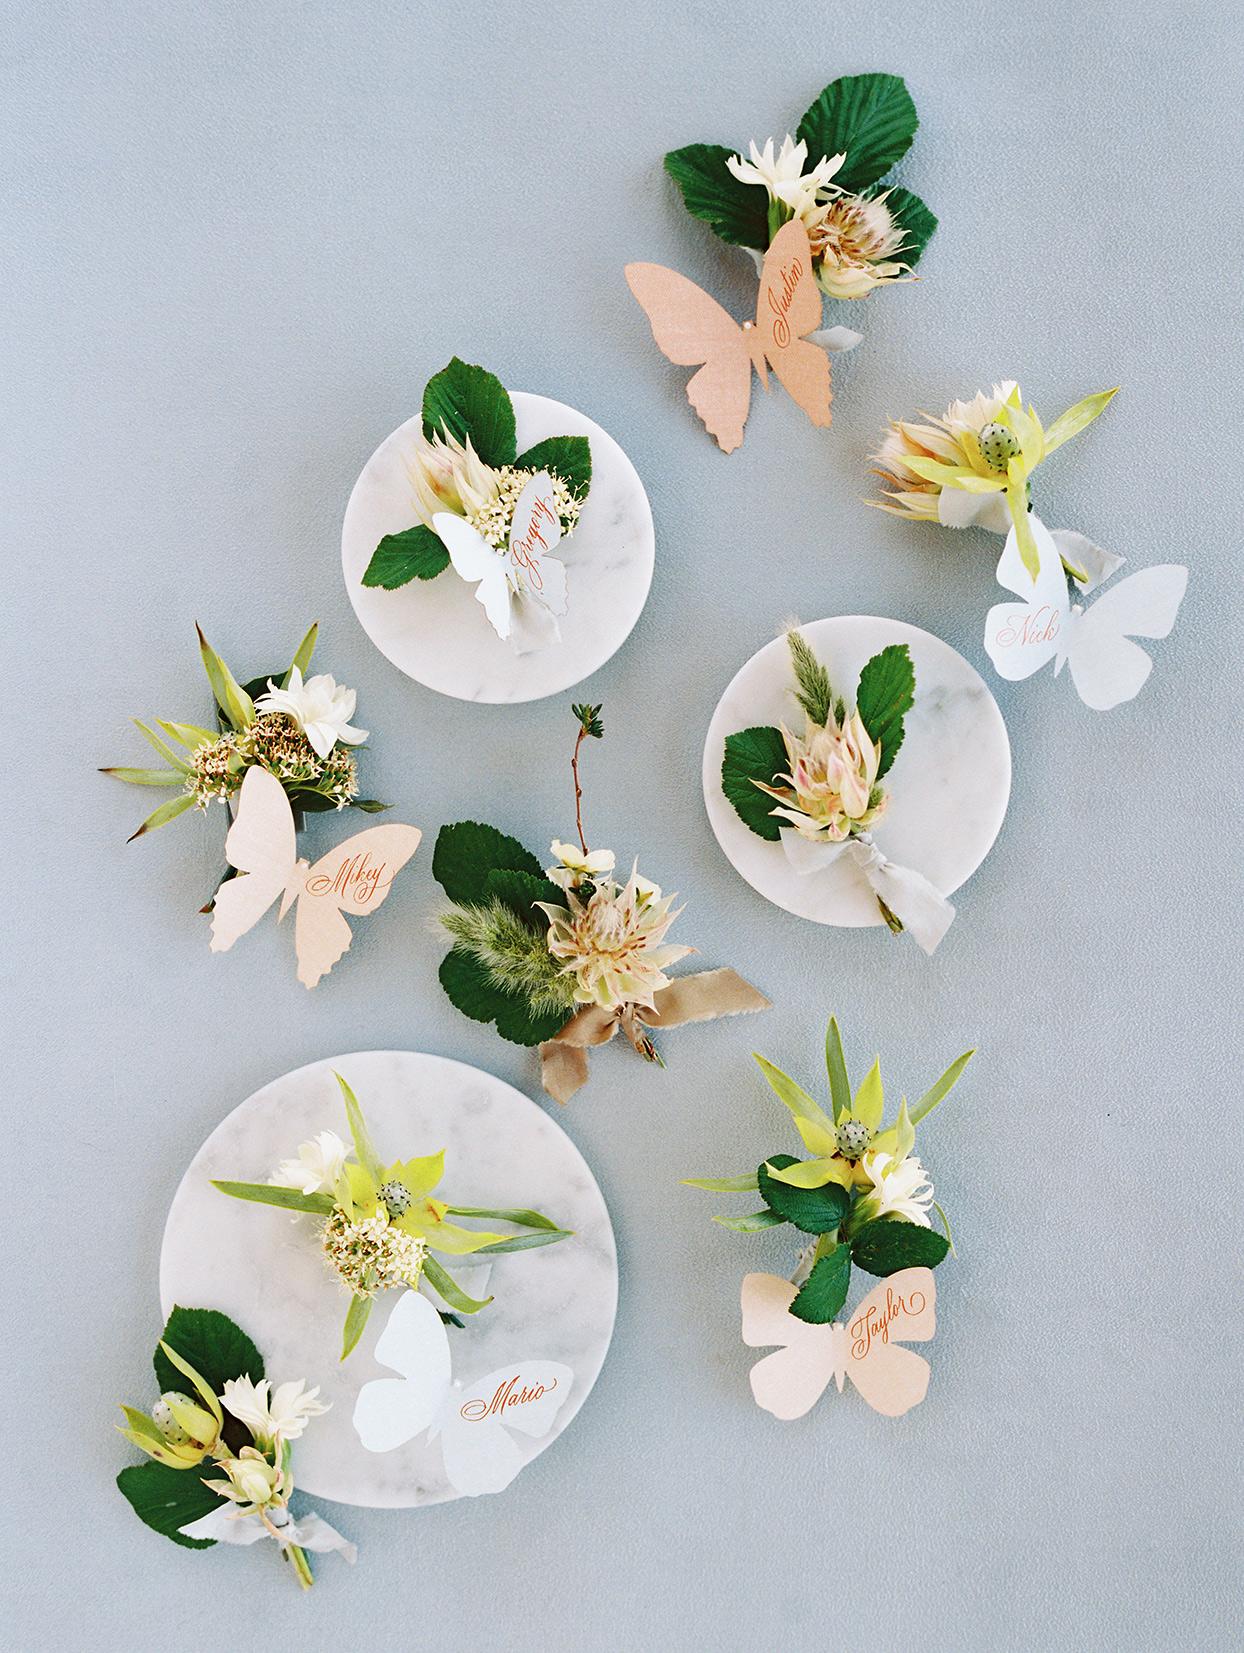 asha andrew wedding boutonnieres on plates